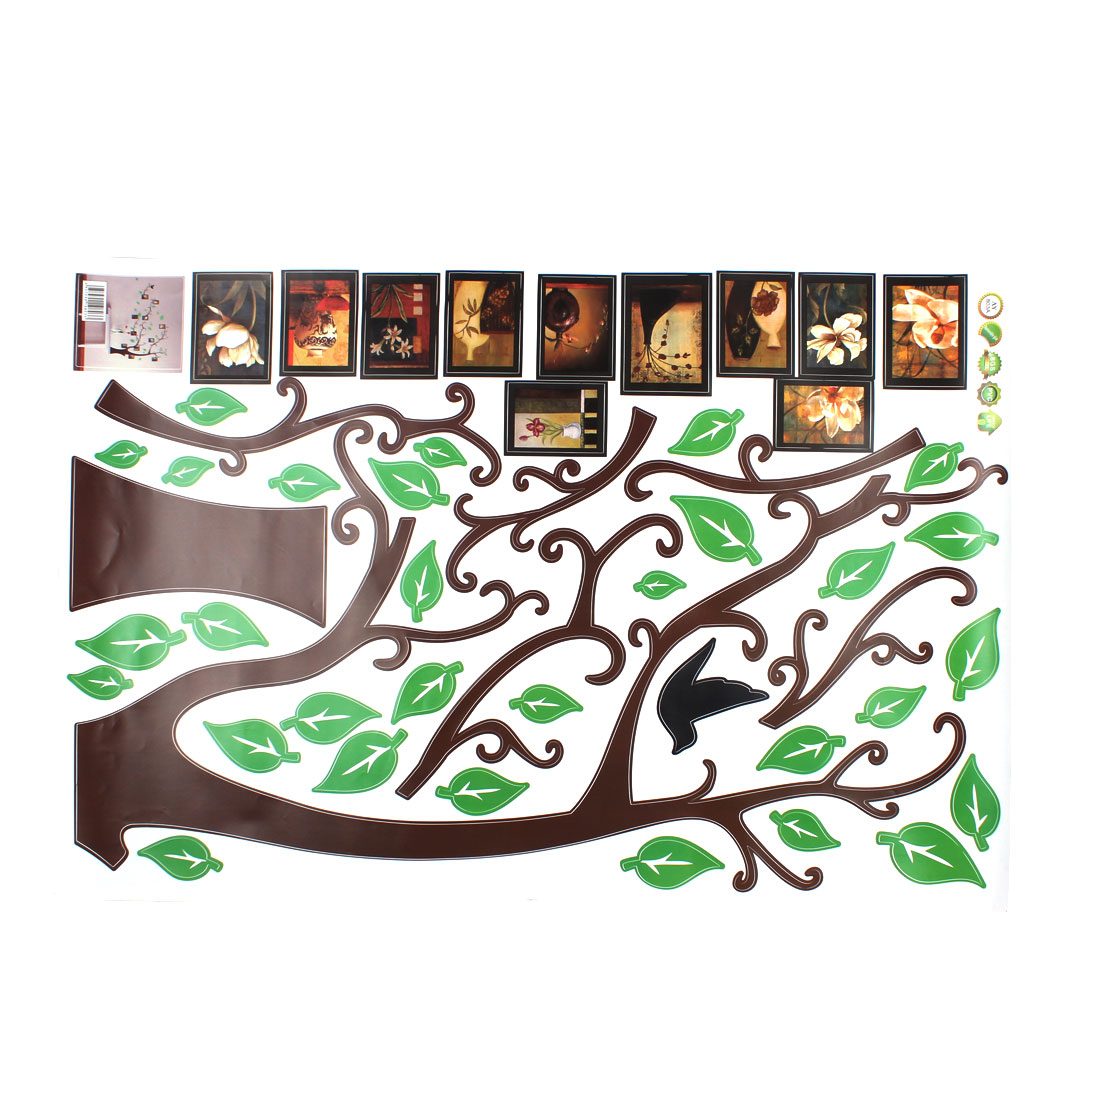 Photo Frame Tree Pattern Wall Sticker Paper Mural 90 x 60cm - image 1 de 3